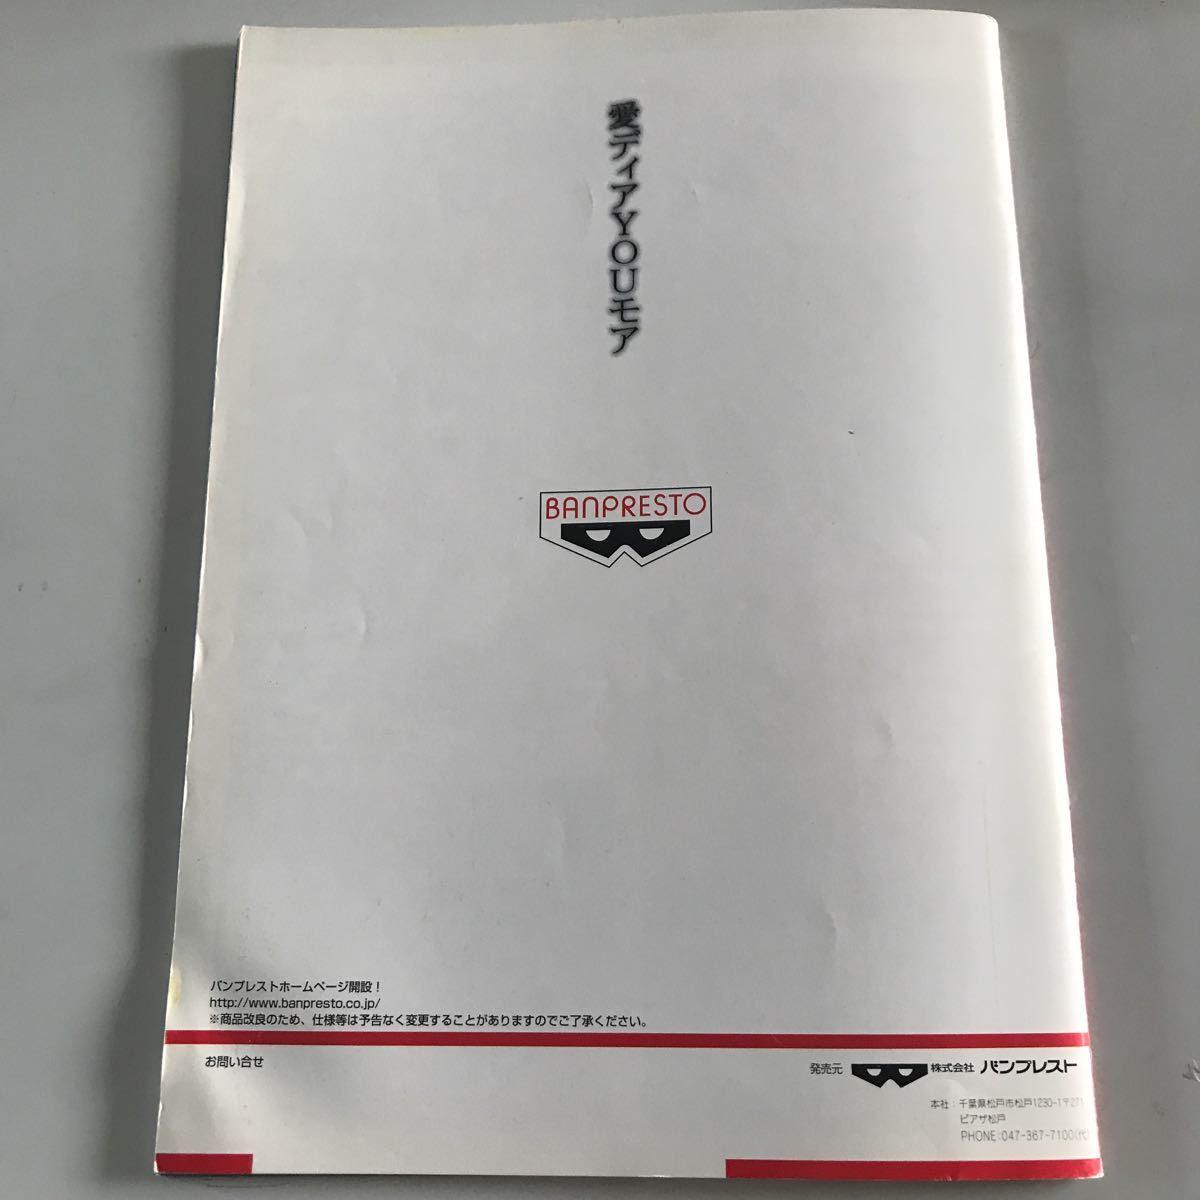 No.457 アーケードゲーム BANPRESTO プライズ 業務用 非売品 カタログ バンプレスト 景品 カタログ_画像10